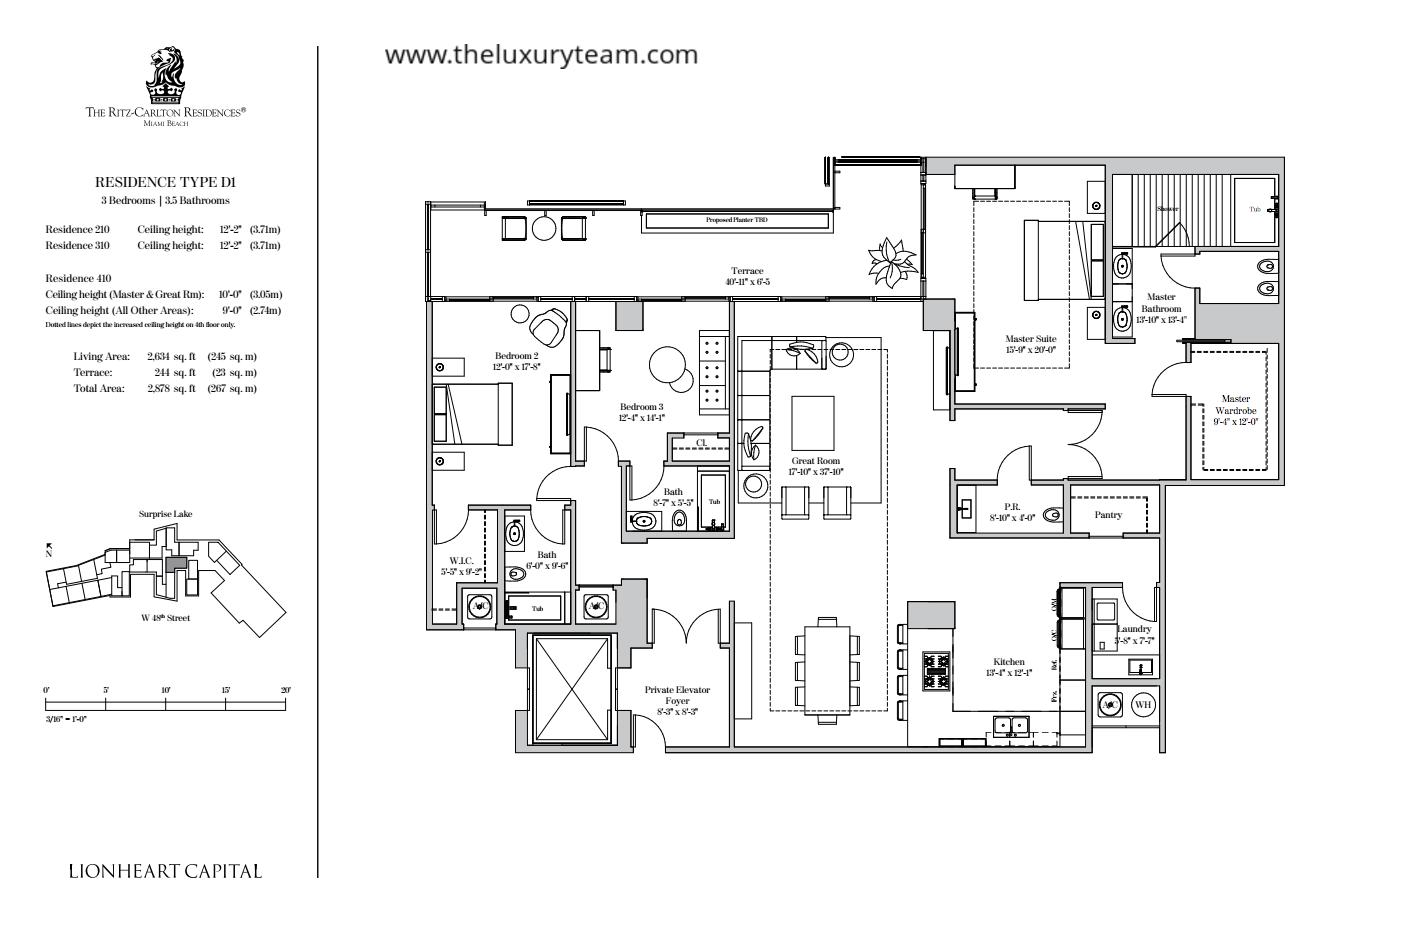 New Condos At Ritz Carlton Residences Sunny Isles The